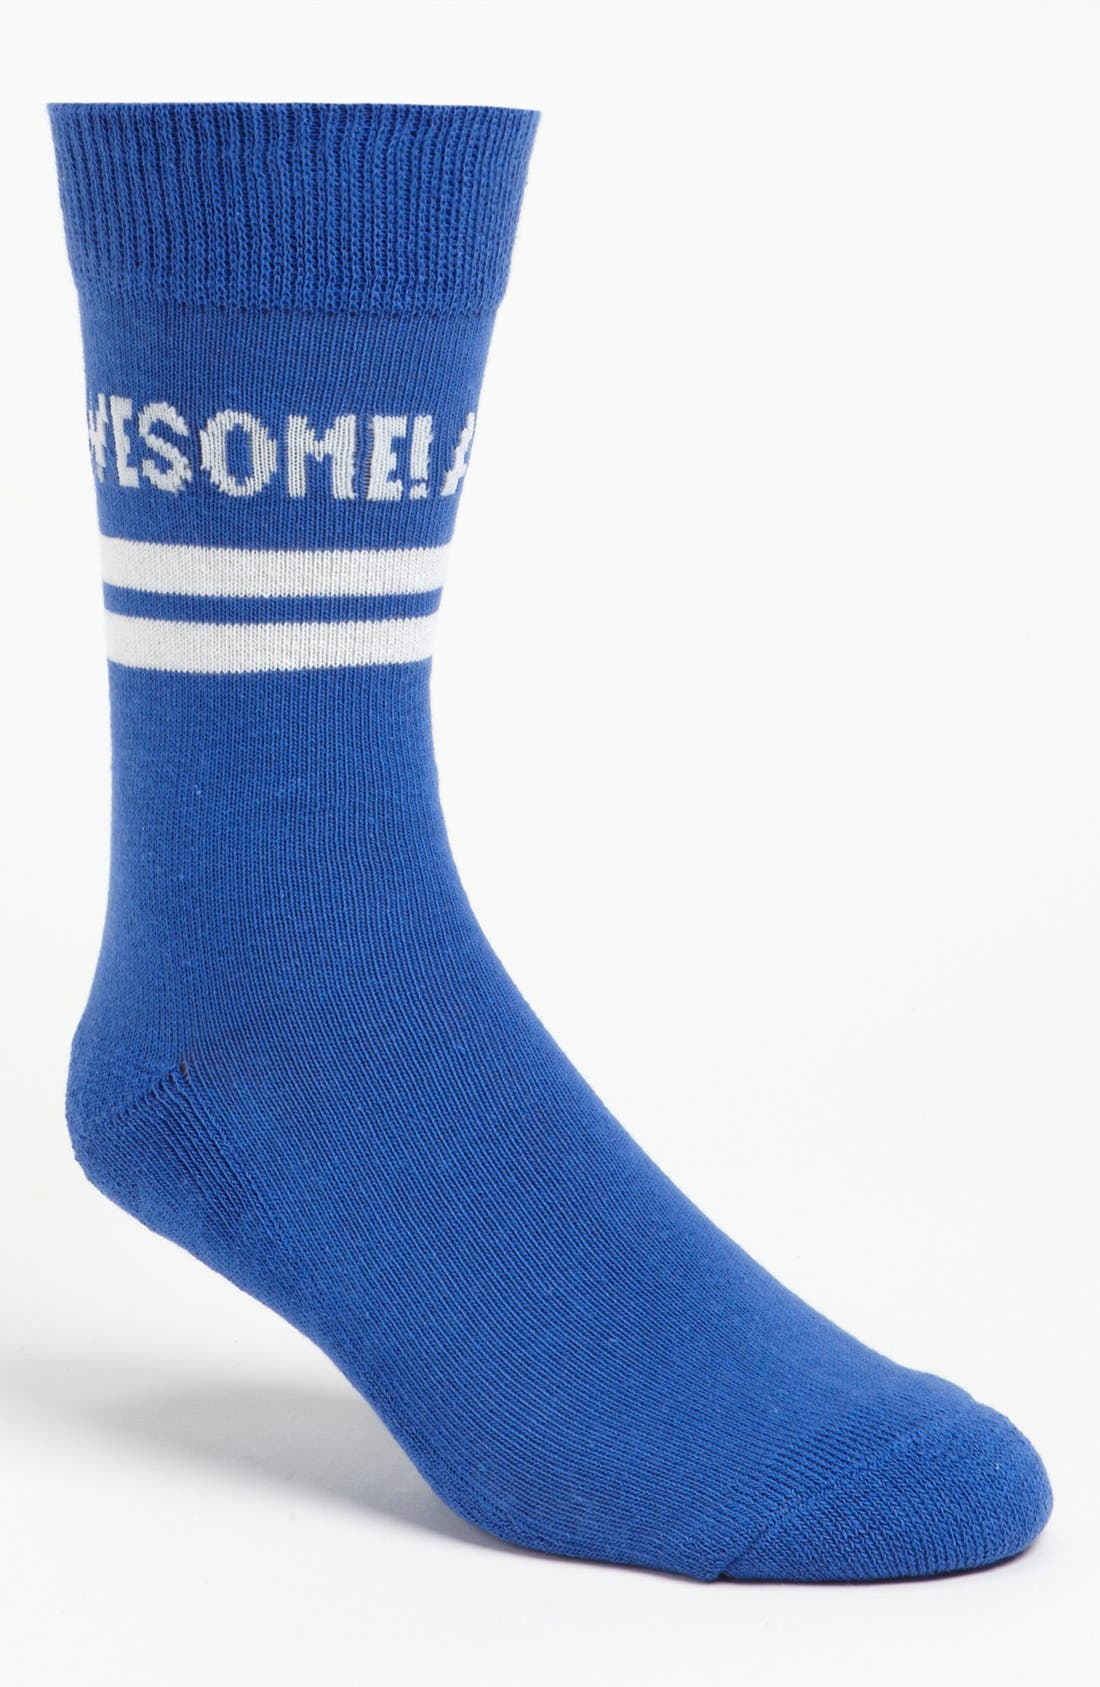 Alternate Image 1 Selected - Topman 'Awesome' Crew Socks